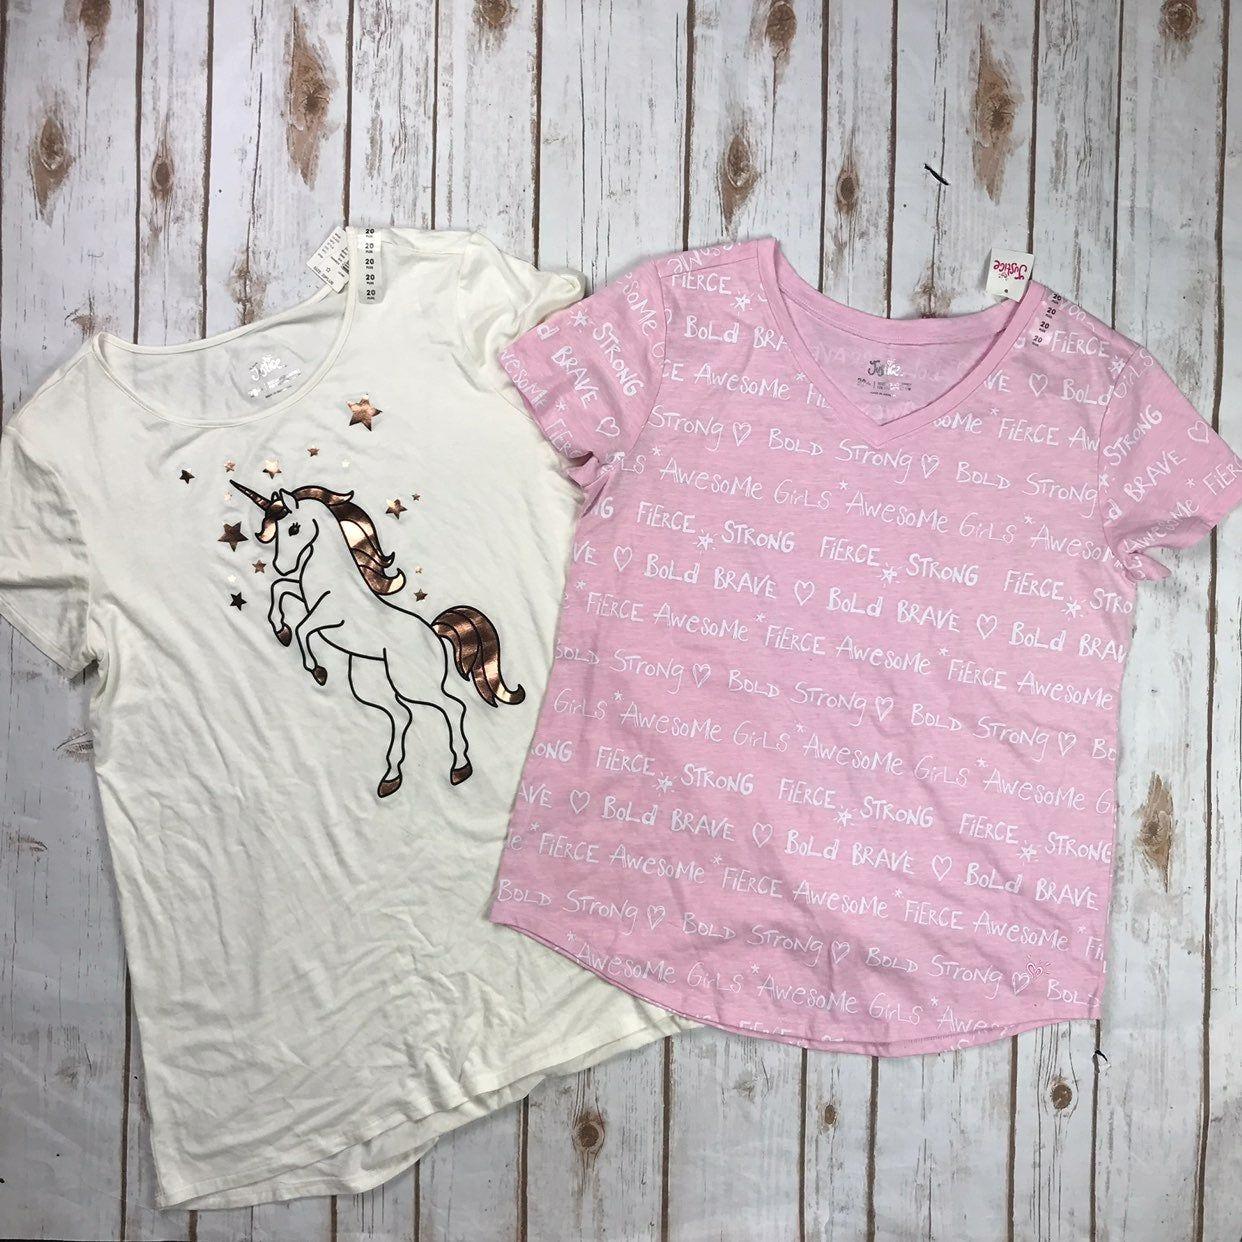 Justice Nwt Girls Shirts Size 20 Justice Shirts Shirts For Girls Shirts